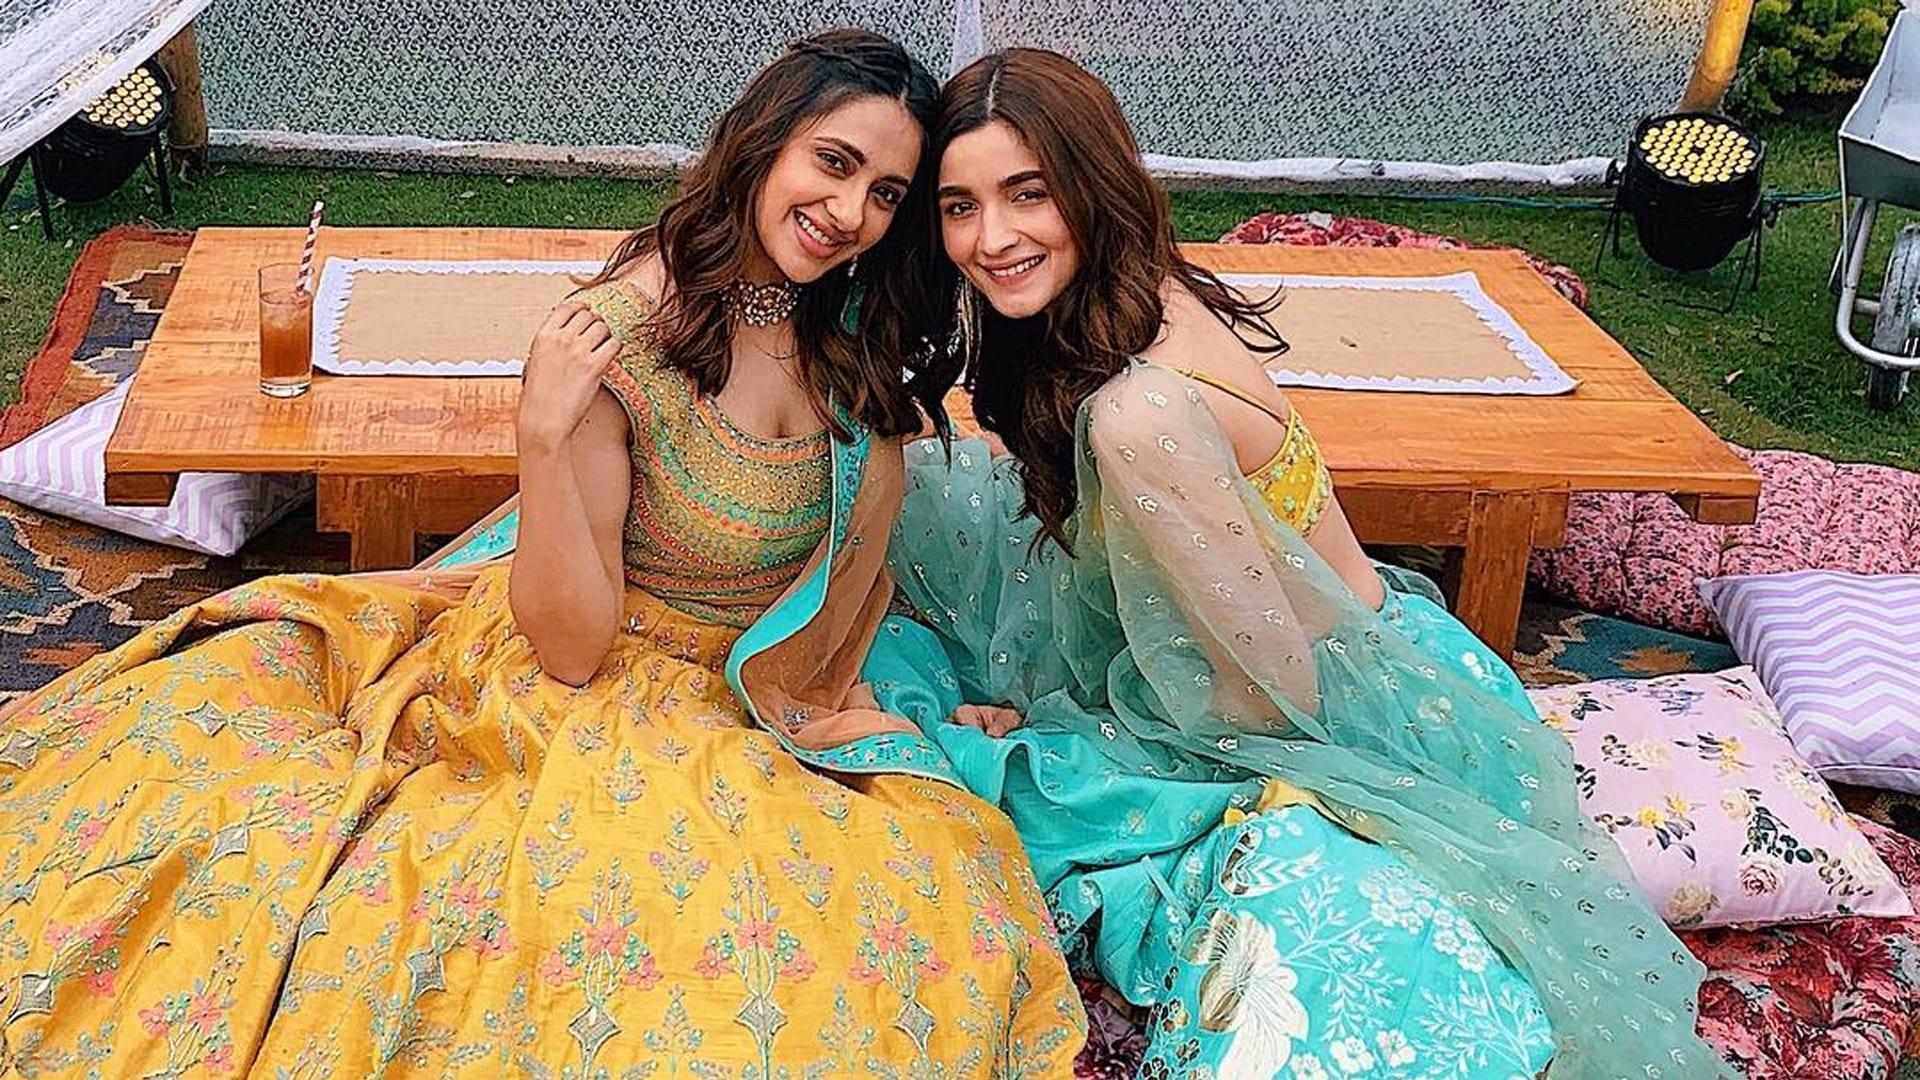 who is Alia Bhatt dating?